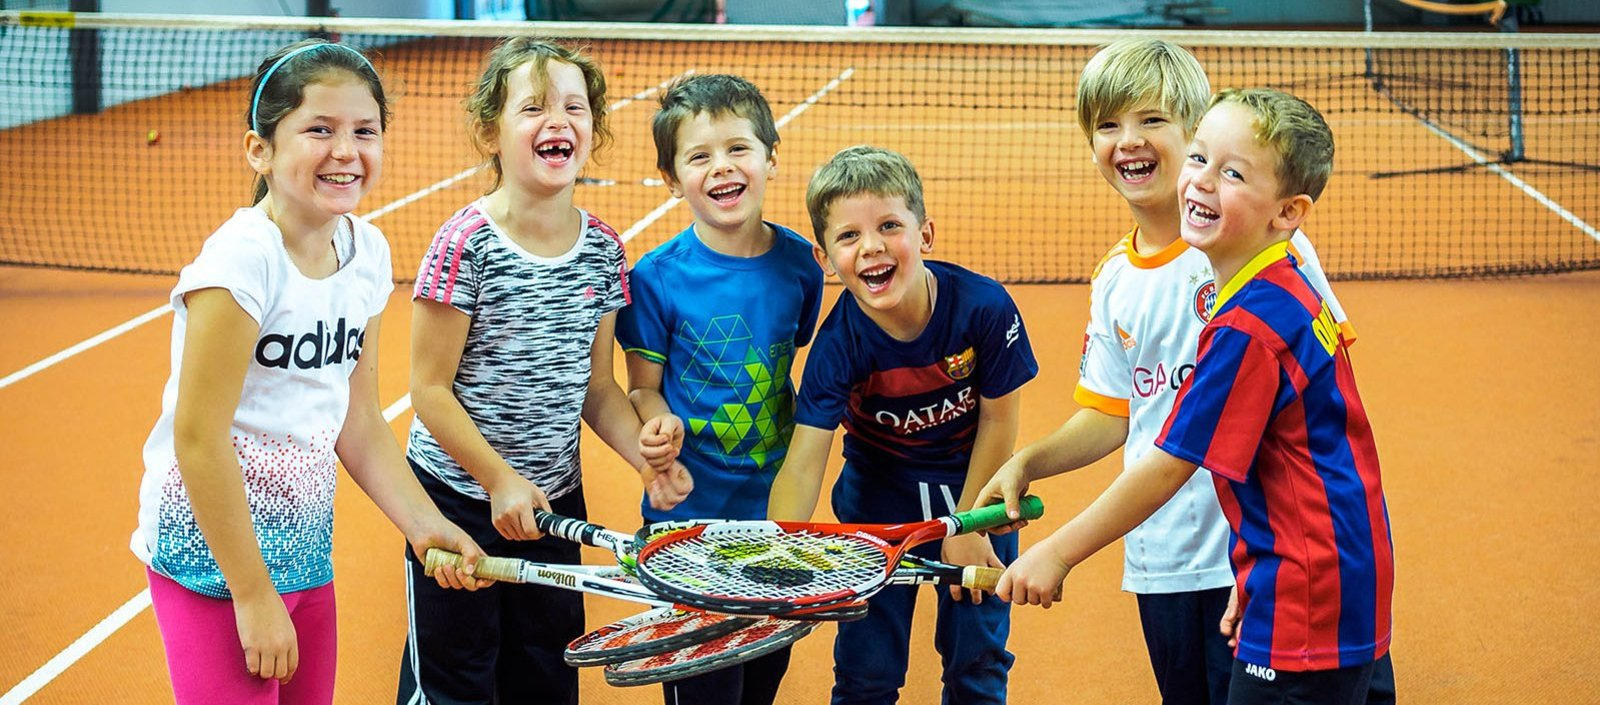 Tennis Saarland